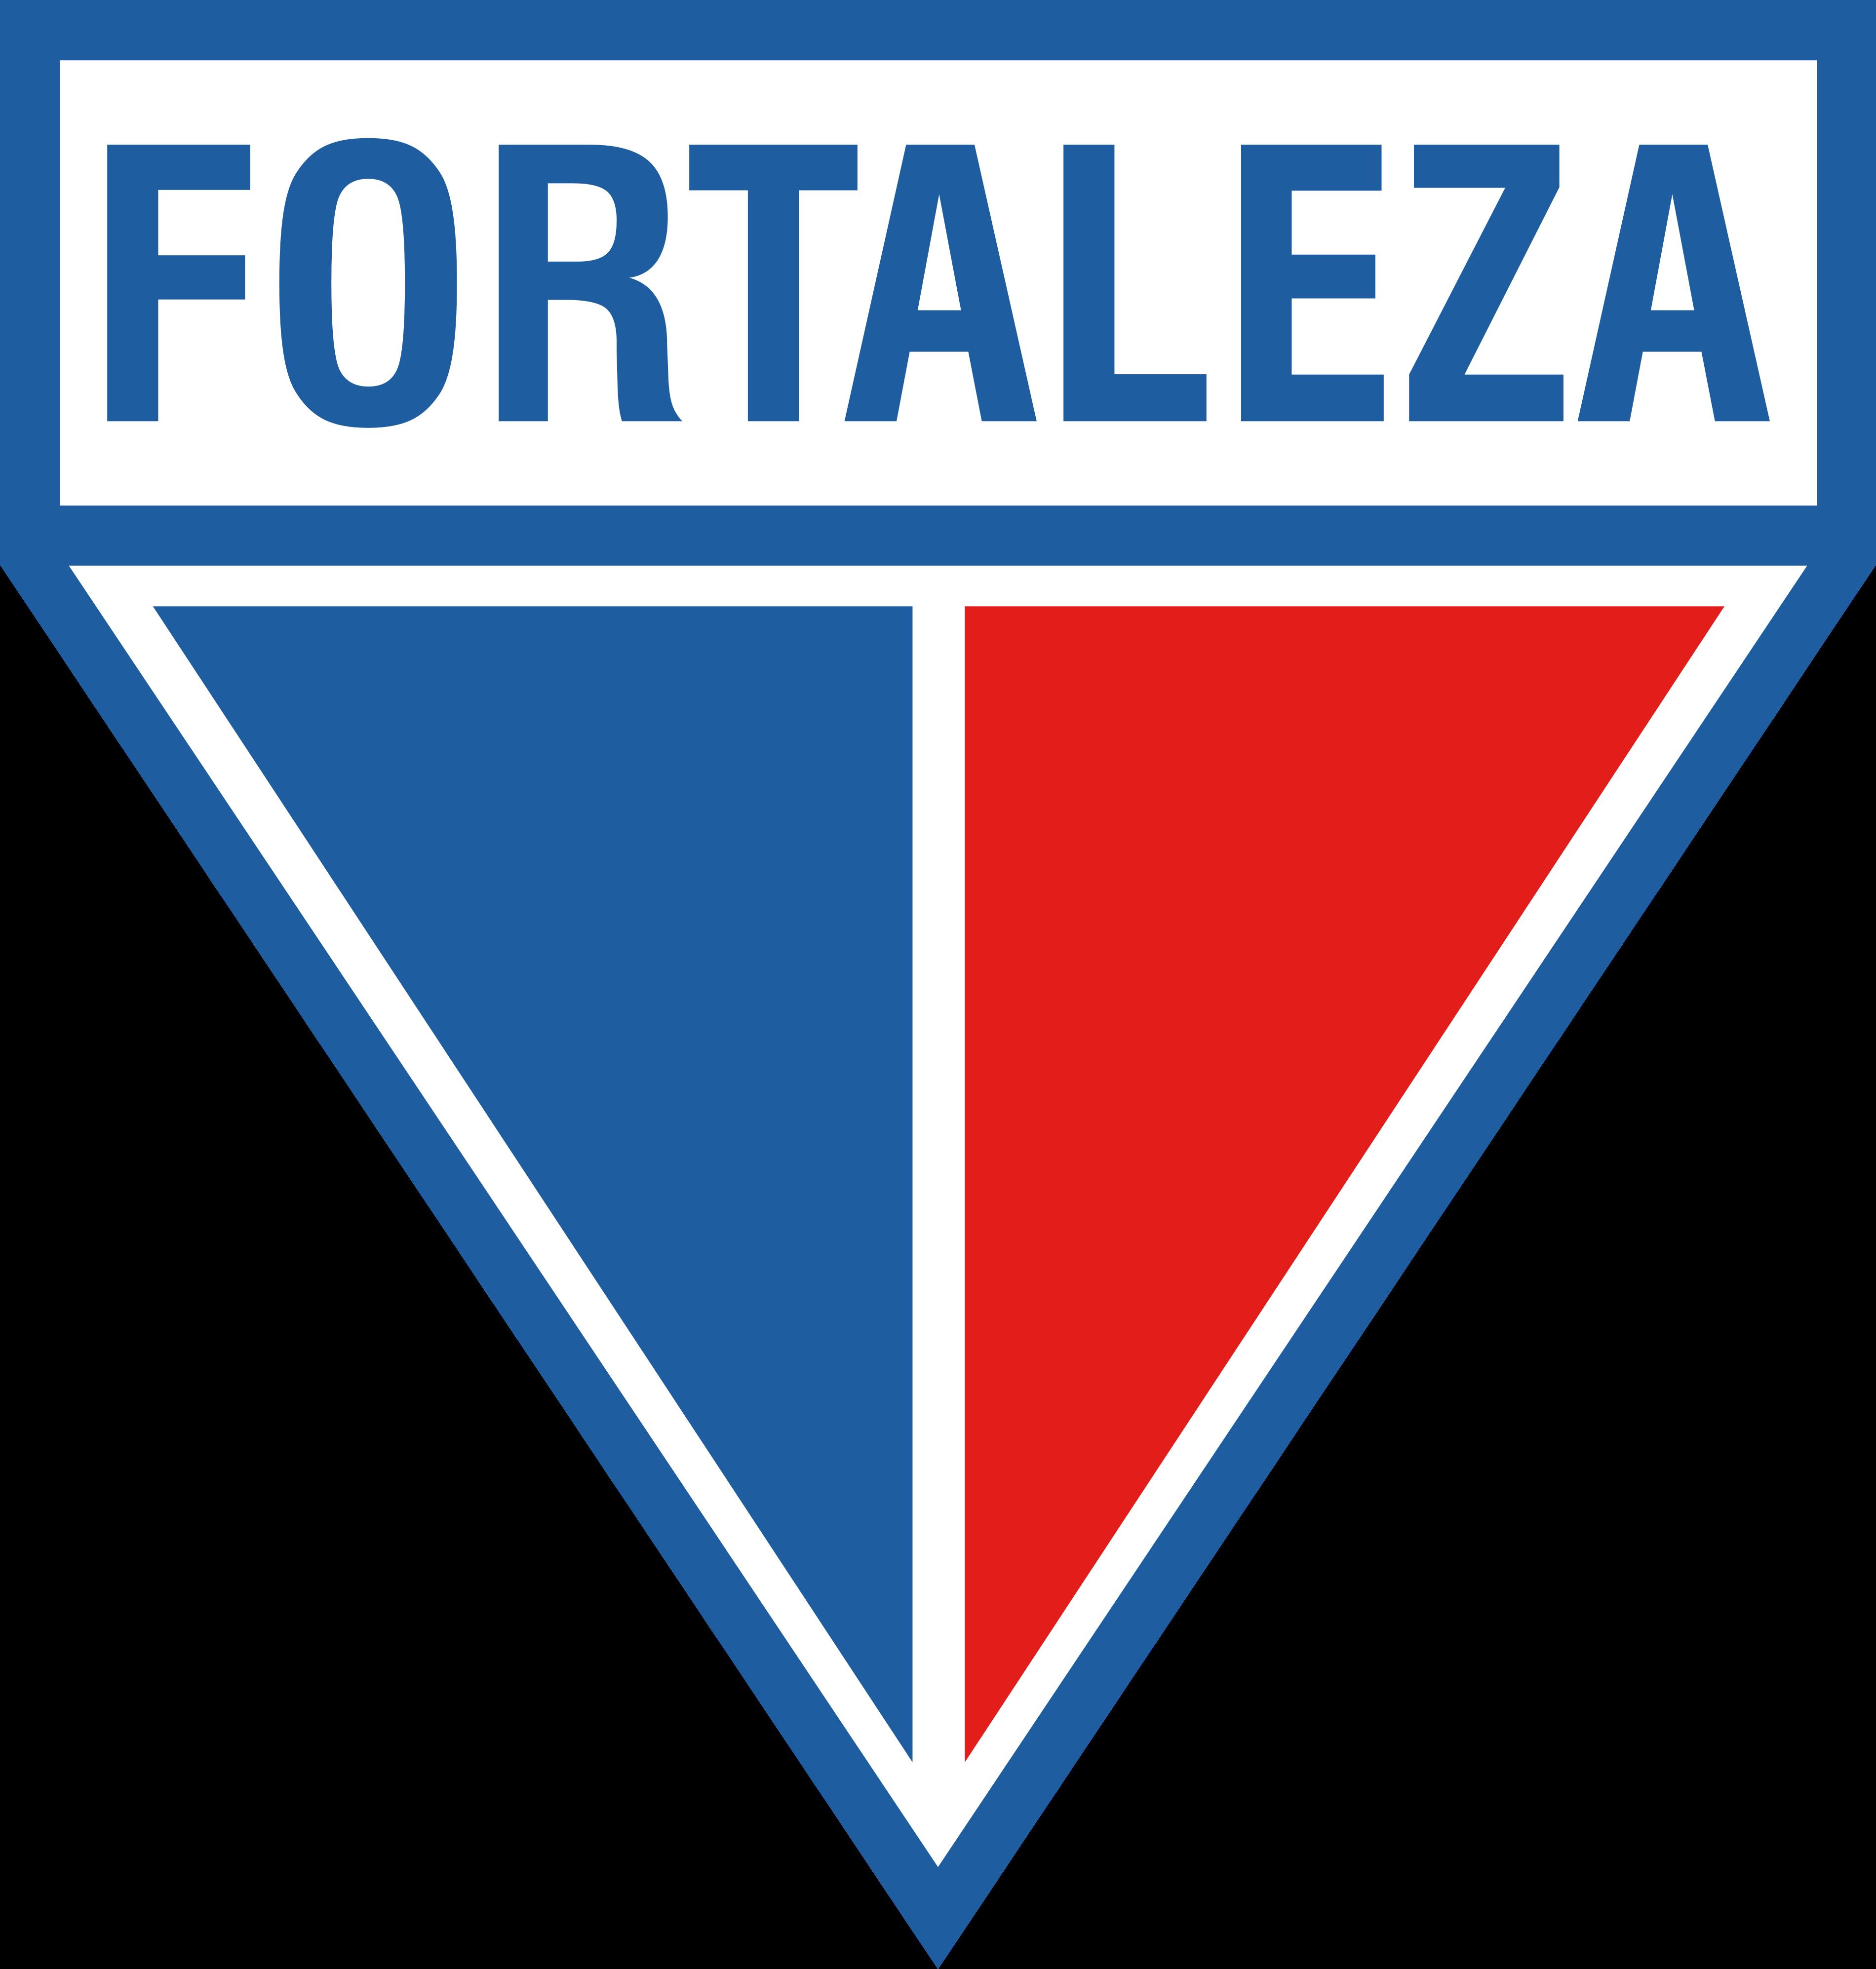 fortaleza-escudo